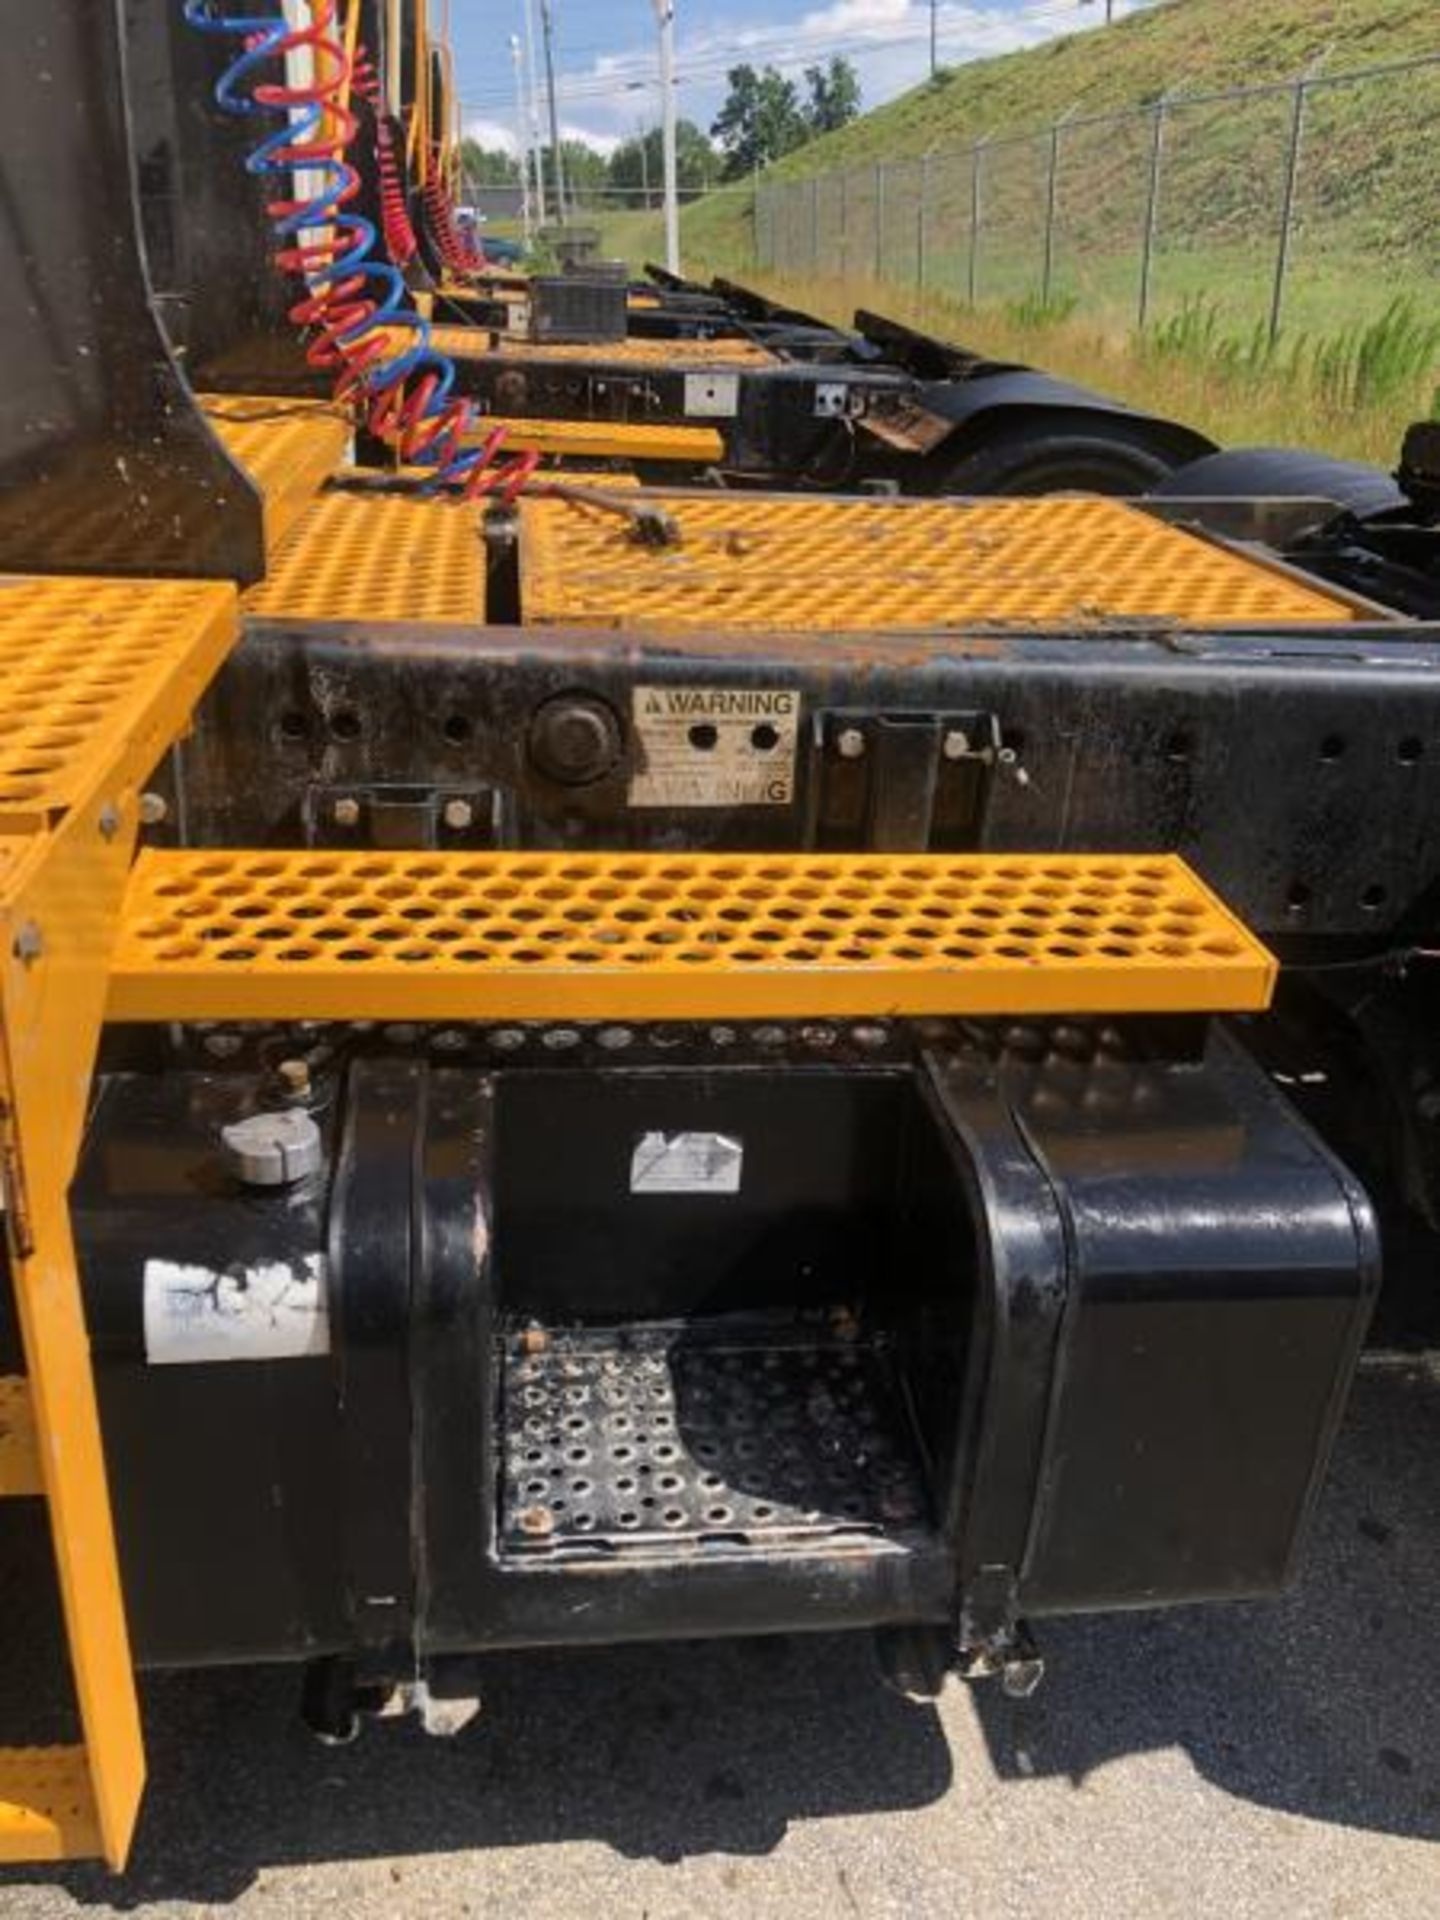 2015 Kalmar Ottawa 4x2 Yard Truck , SN: 338836 1,939.0 Hours, 1,961 Miles - Image 6 of 33